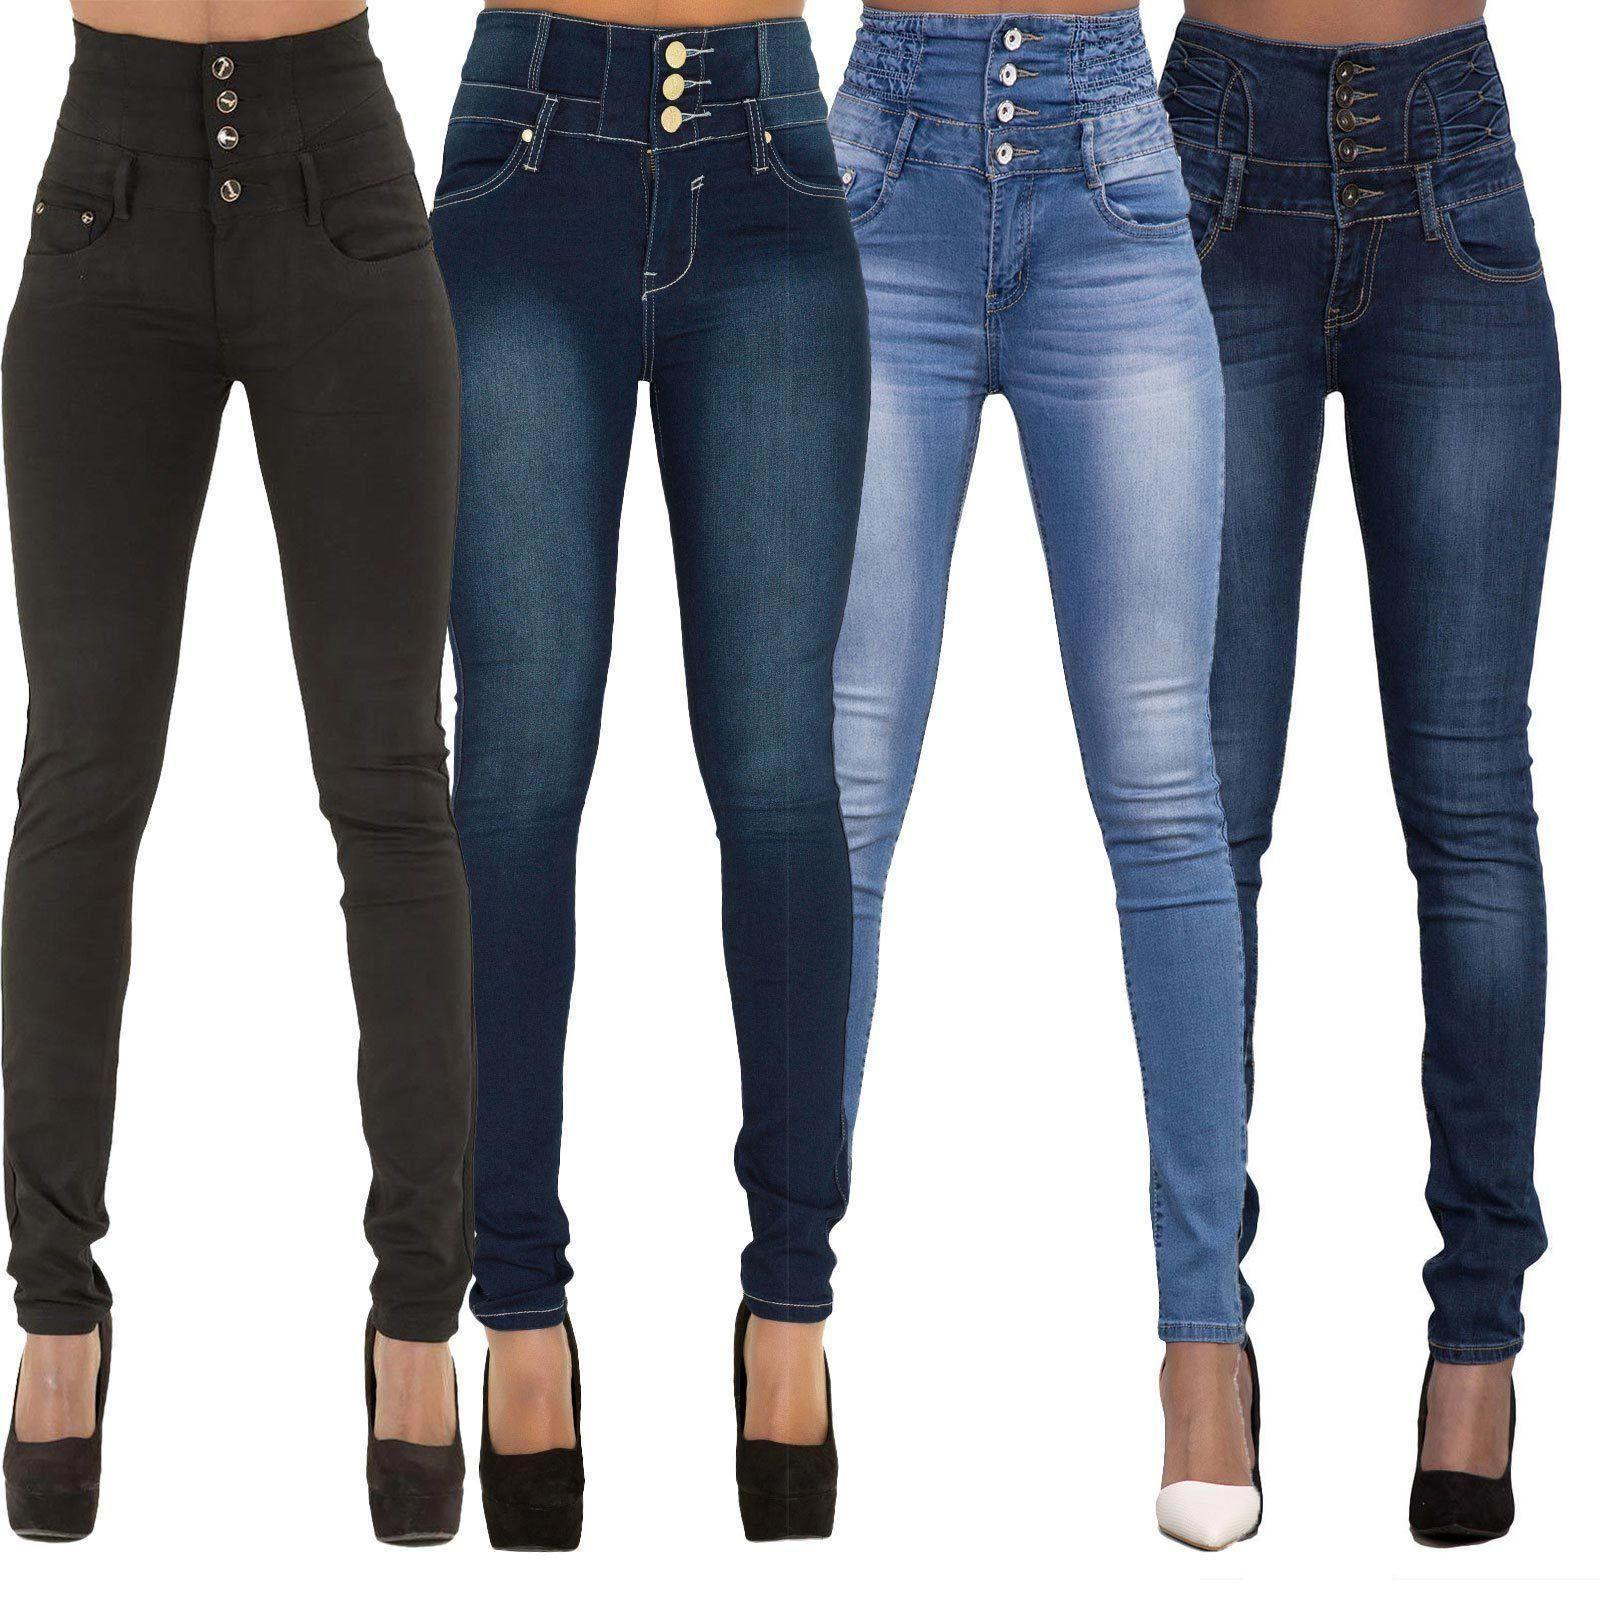 f29c7ce63005 2019 New Fashion Women Denim Skinny Jeggings Pants High Waist Stretch Jeans  Slim Pencil Pants Elastic Trousers From Uberan